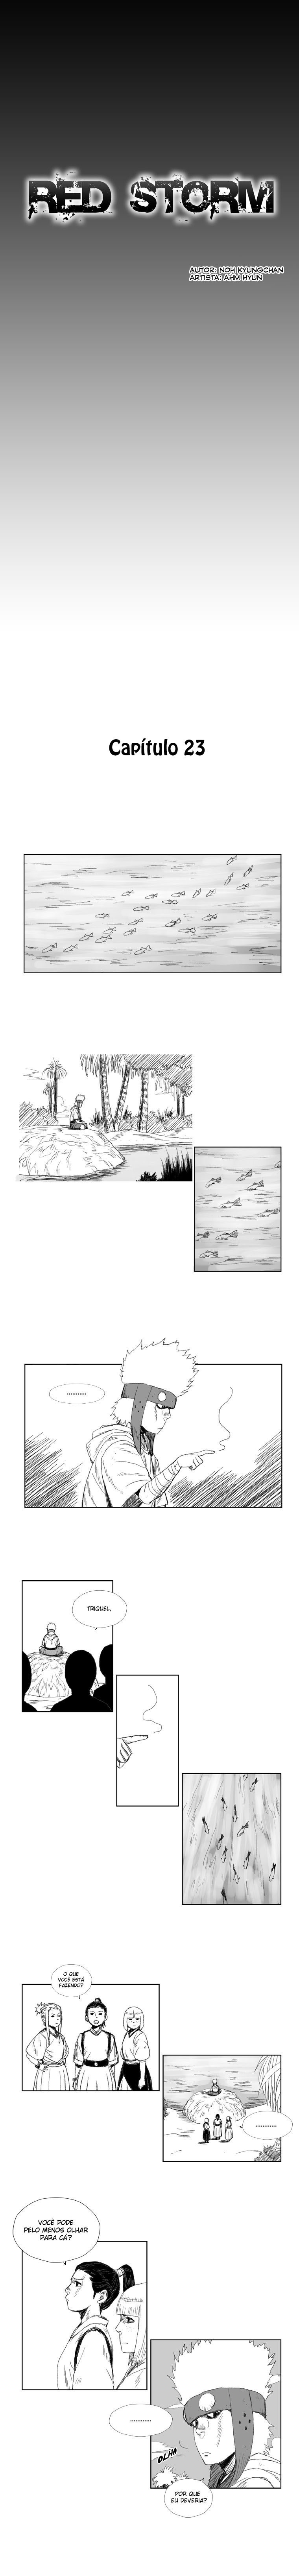 https://nine.mangadogs.com/br_manga/pic/29/1501/616314/RedStorm023483.jpg Page 2